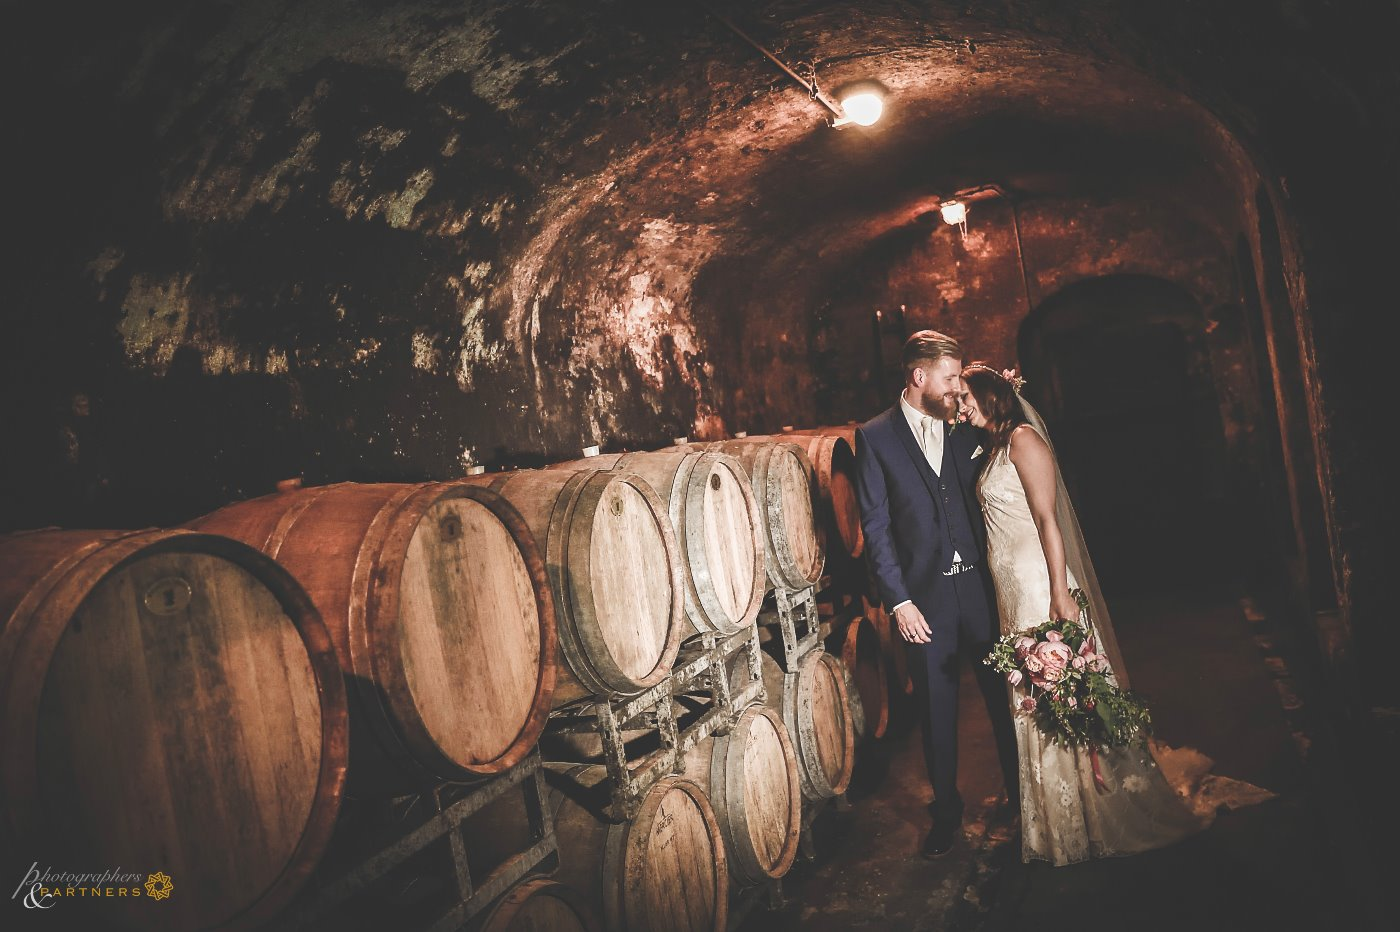 photos_weddings_castello_oliveto_17.jpg